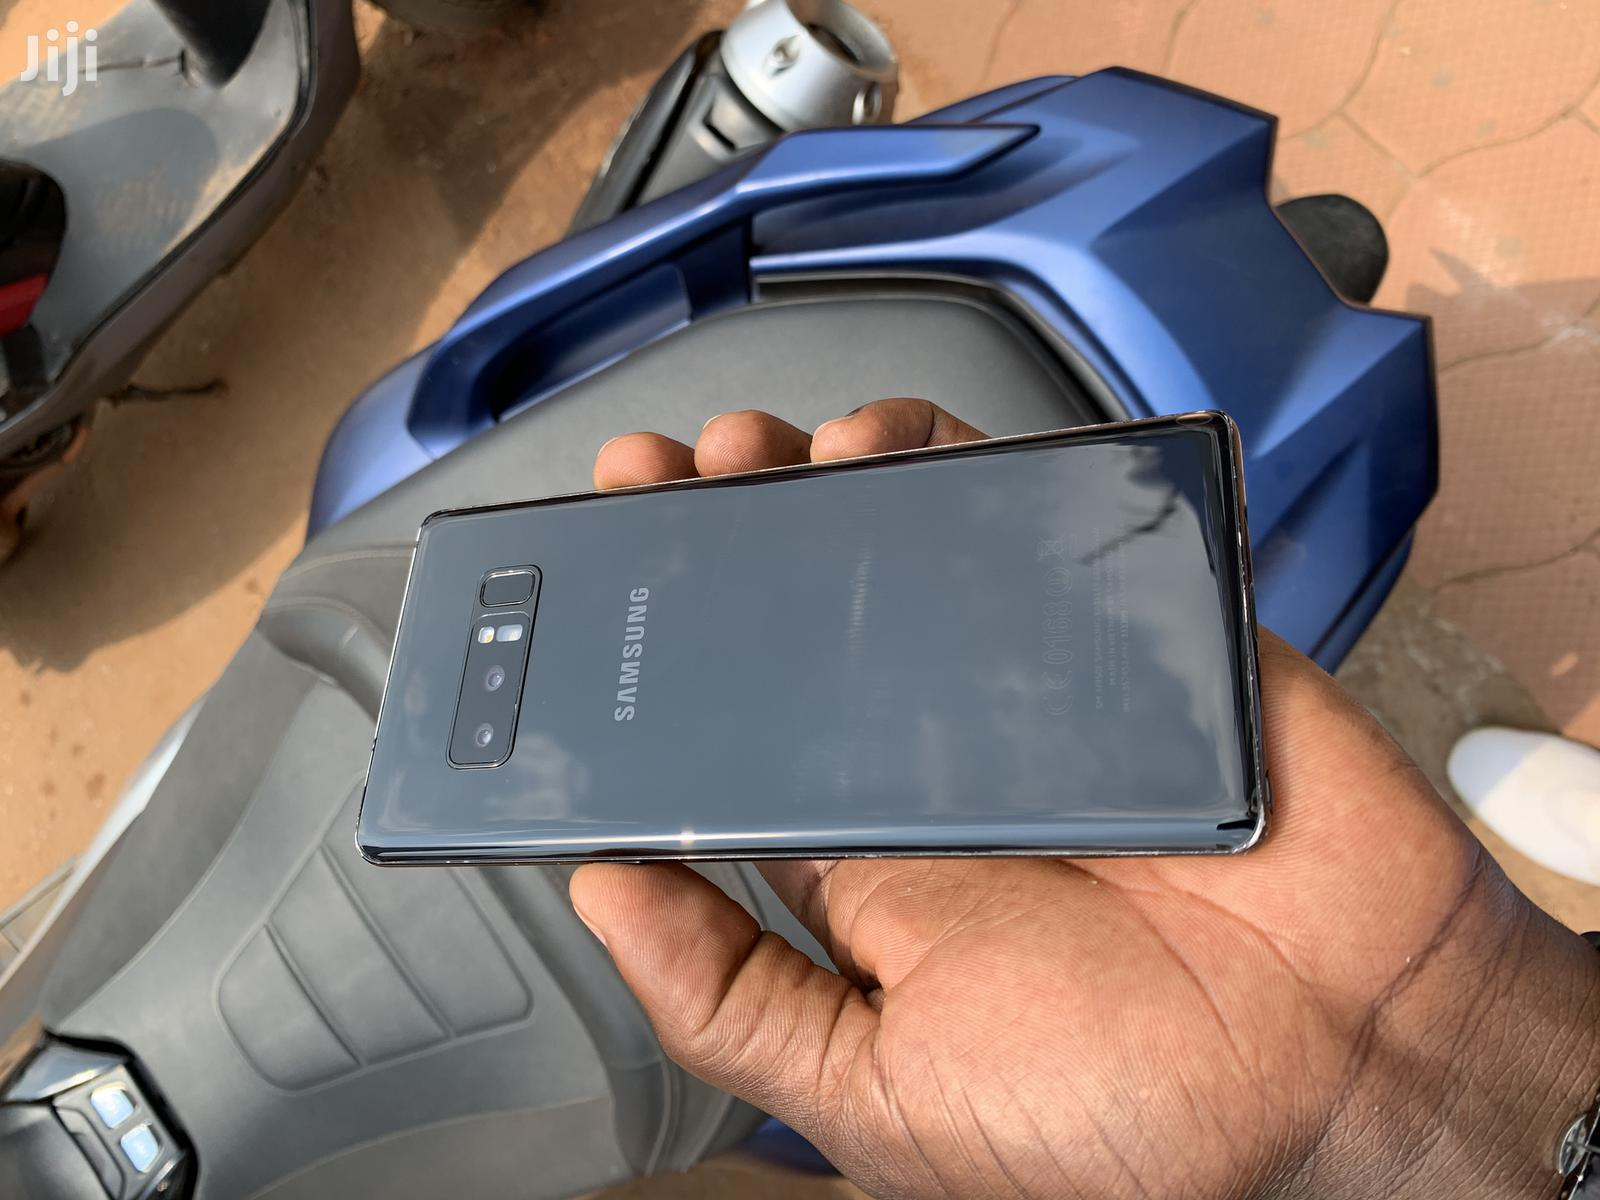 Samsung Galaxy Note 8 64 GB Black   Mobile Phones for sale in Kampala, Central Region, Uganda